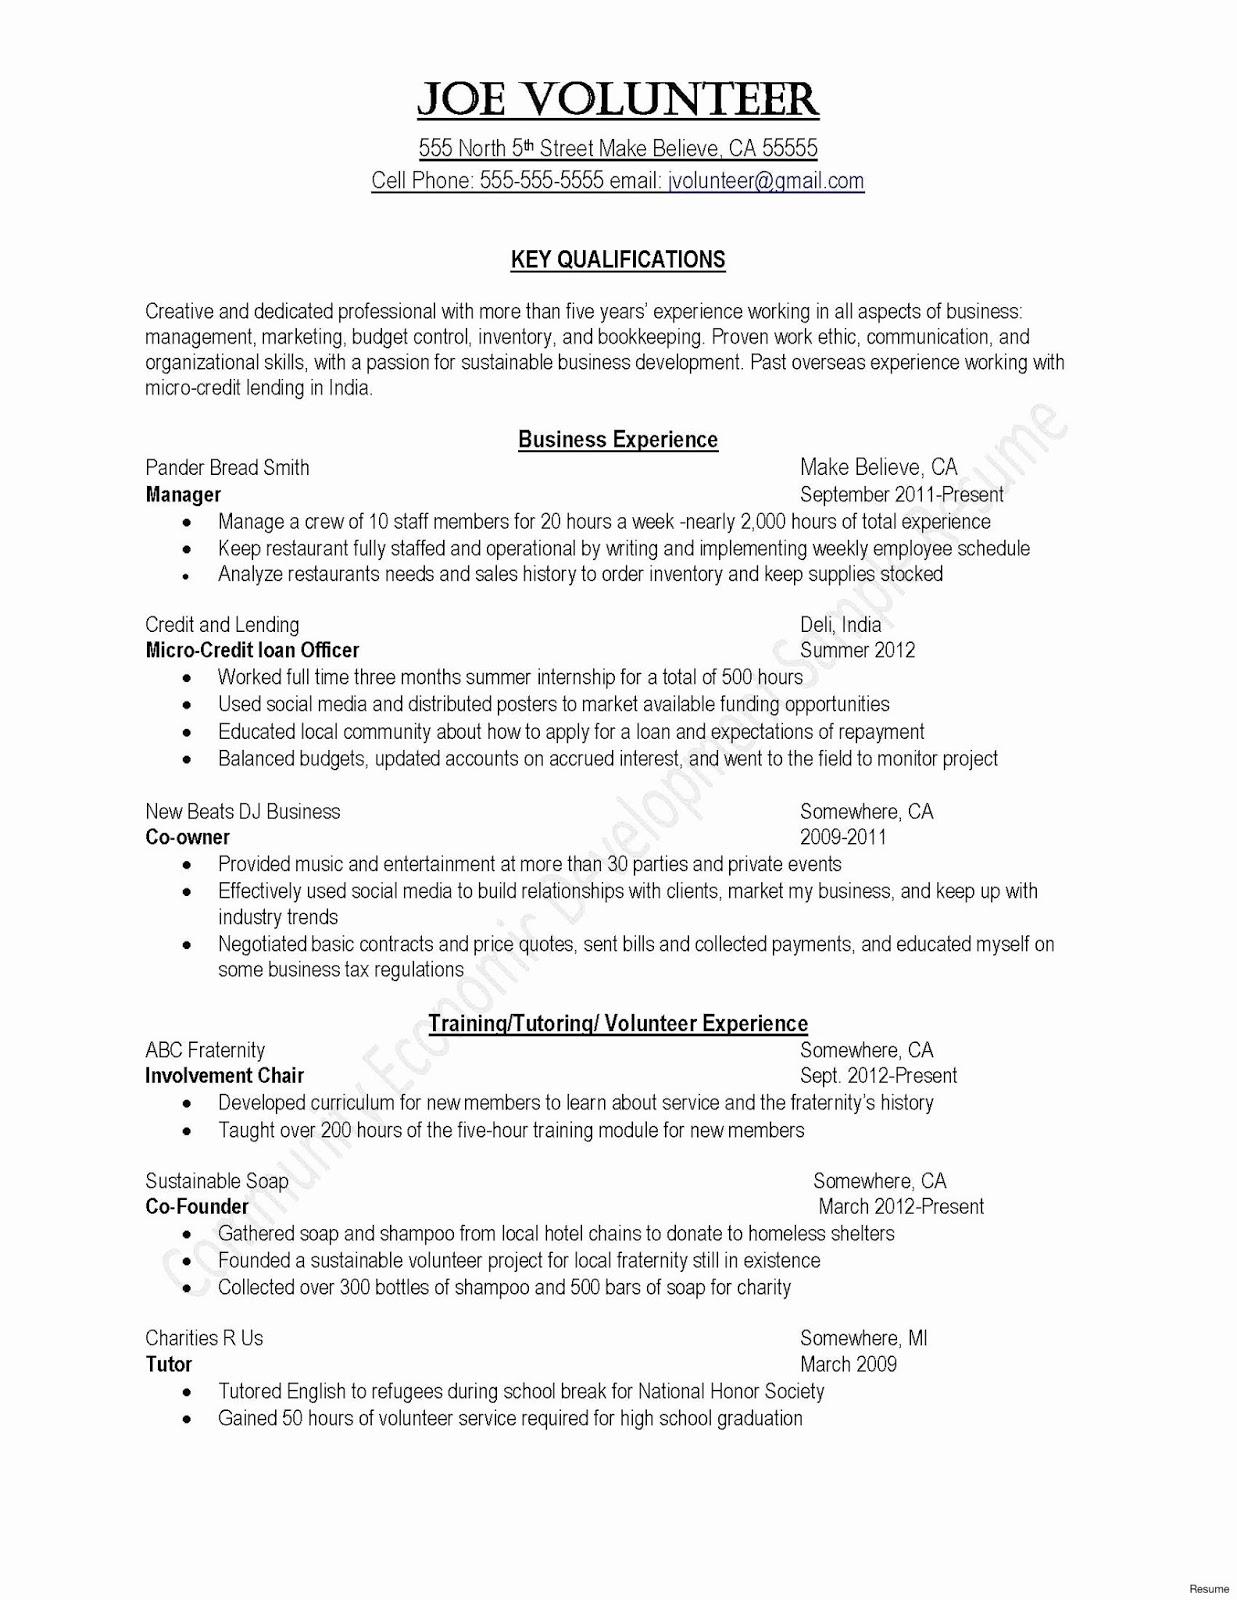 apple resume template apple resume templates for pages apple resume templates free apple resume templates for word apple pages resume templates free apple curriculum vitae template apple pages resume template apple pages resume templates 2018 apple pages resume templates 2017 apple pages resume templates 2019 apple pages resume template download